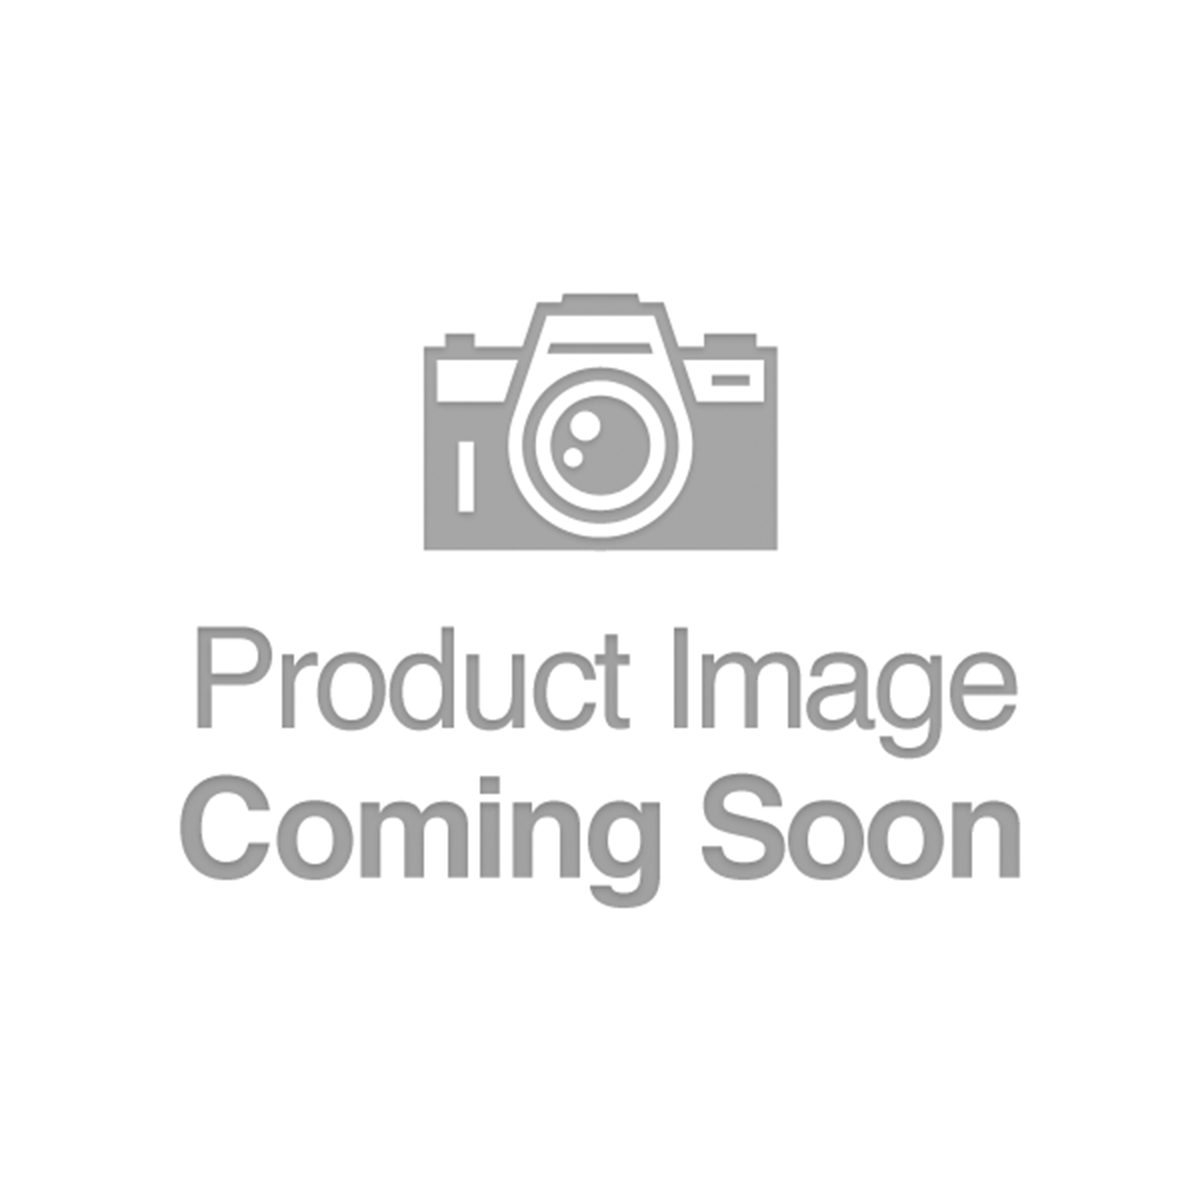 FR 268  $5  1896  Silver Certificate  PCGS 67 PPQ